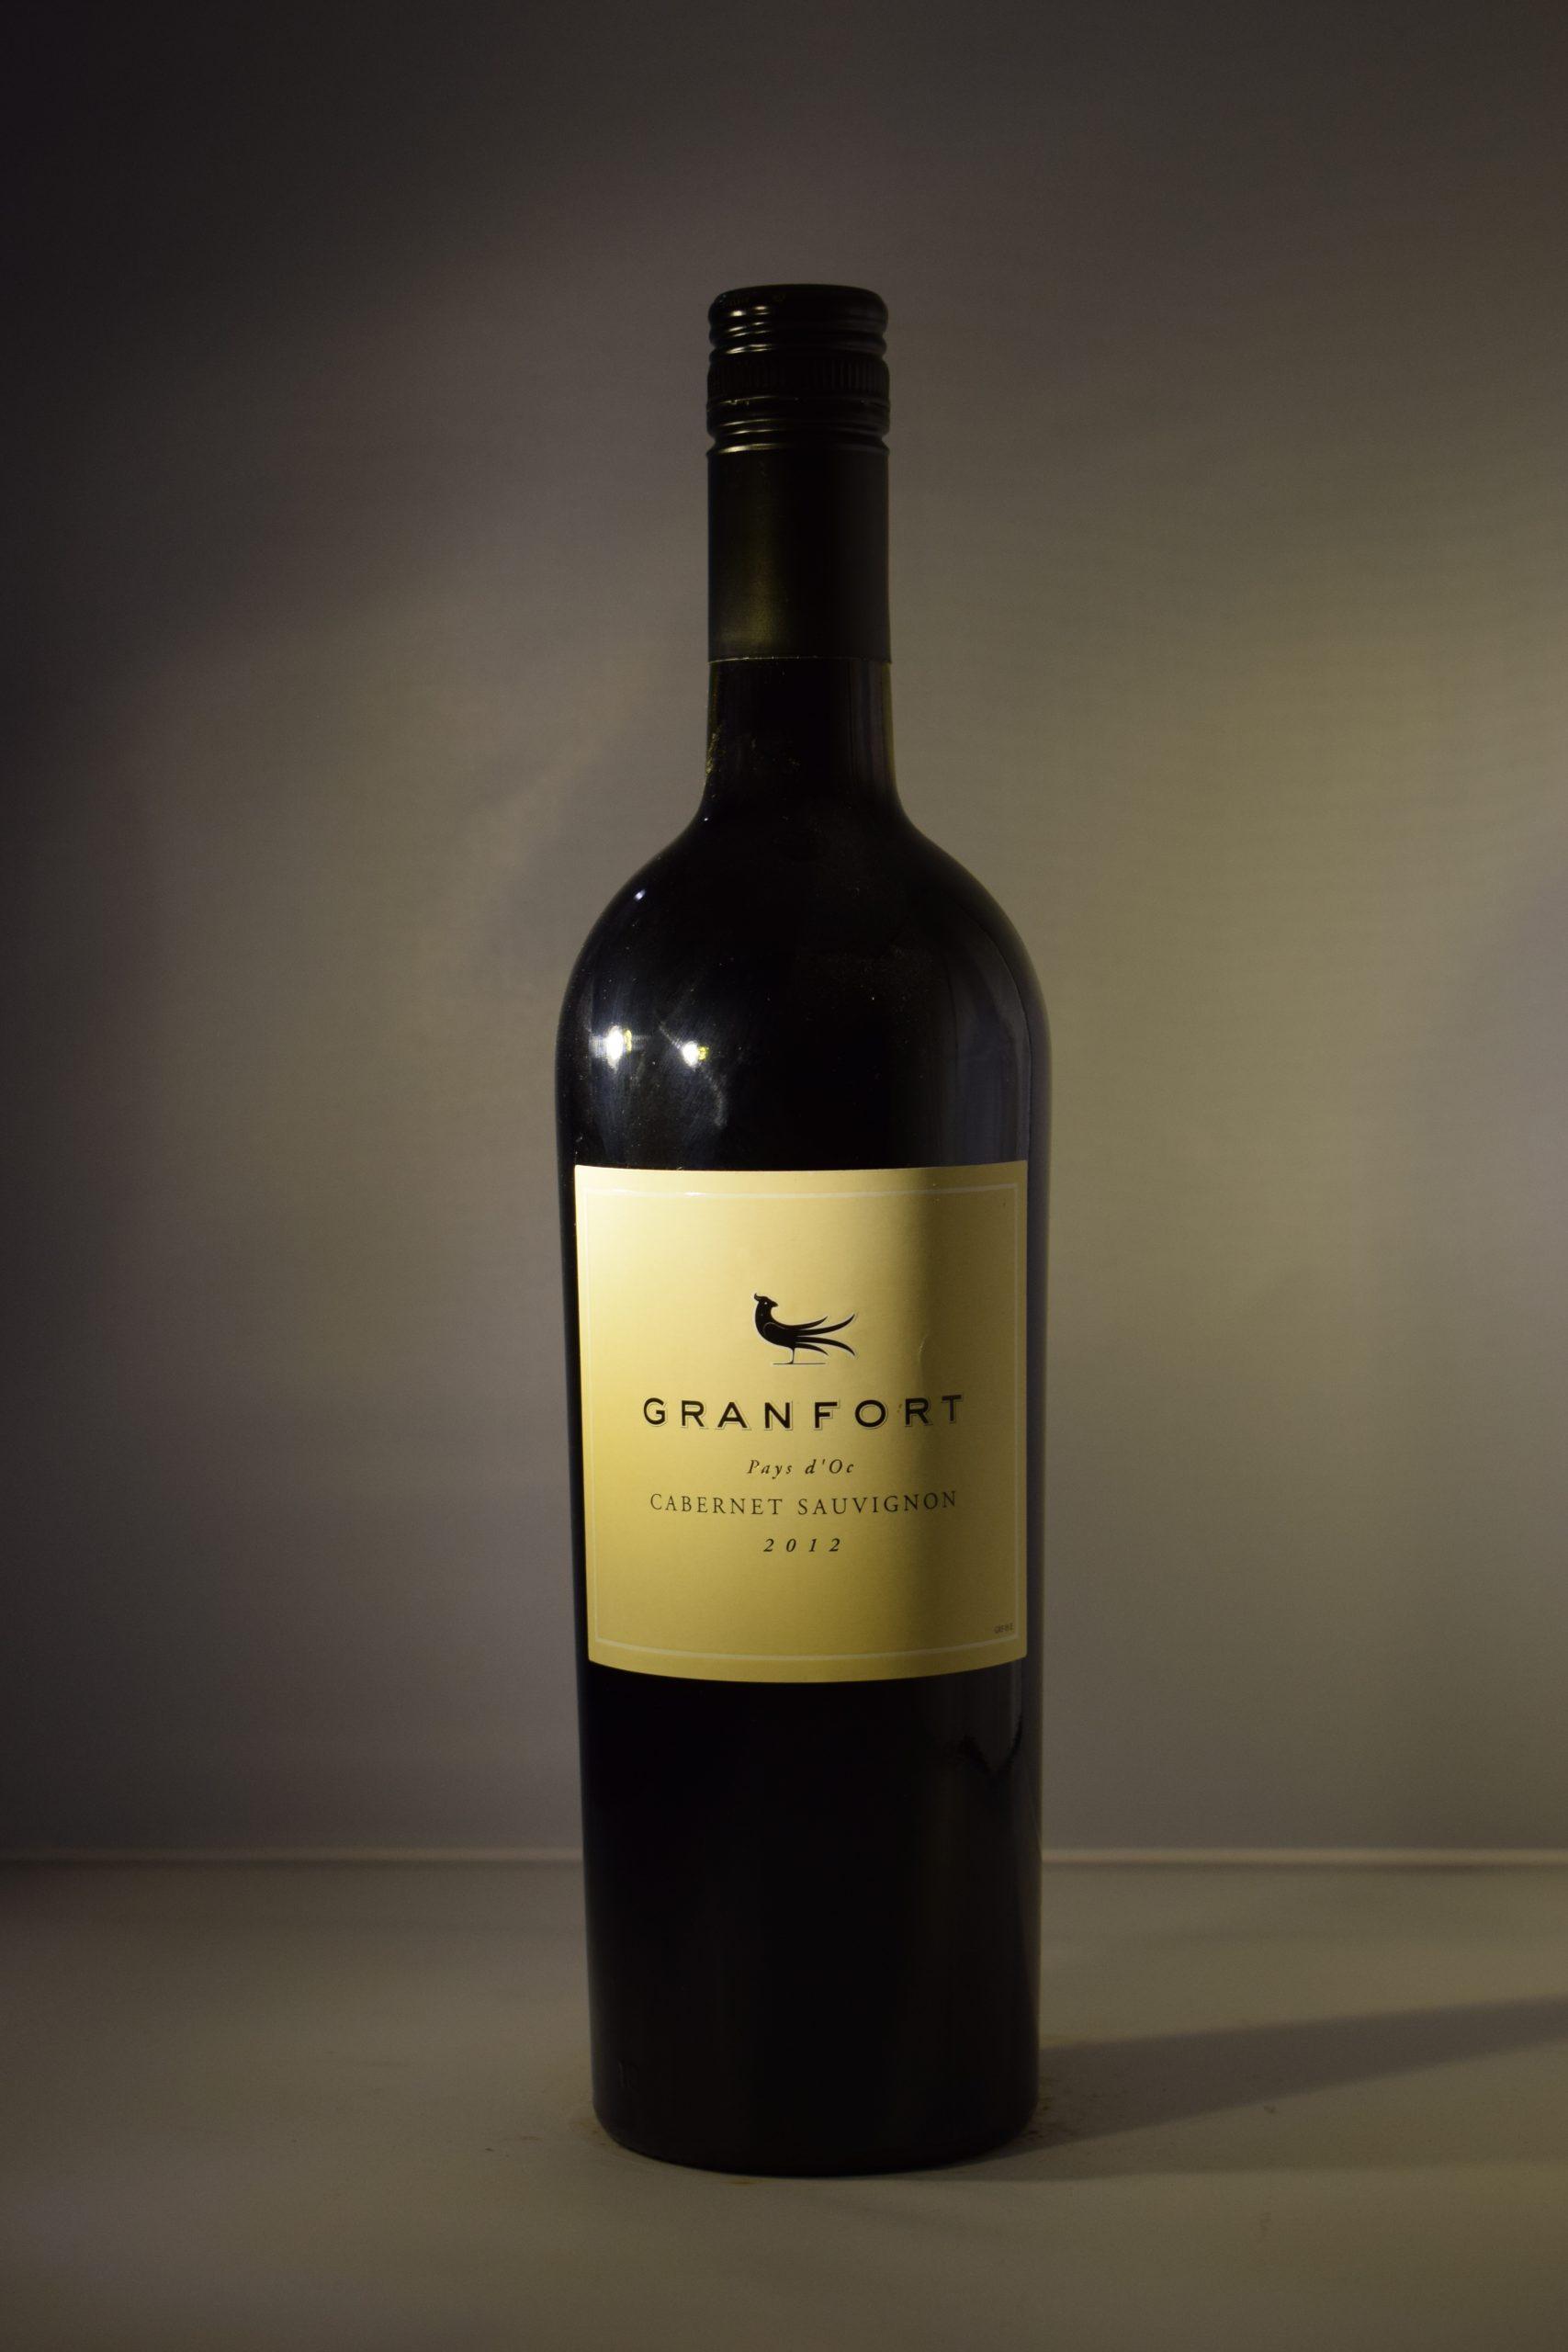 Granfort Cabernet Sauvignon 2012